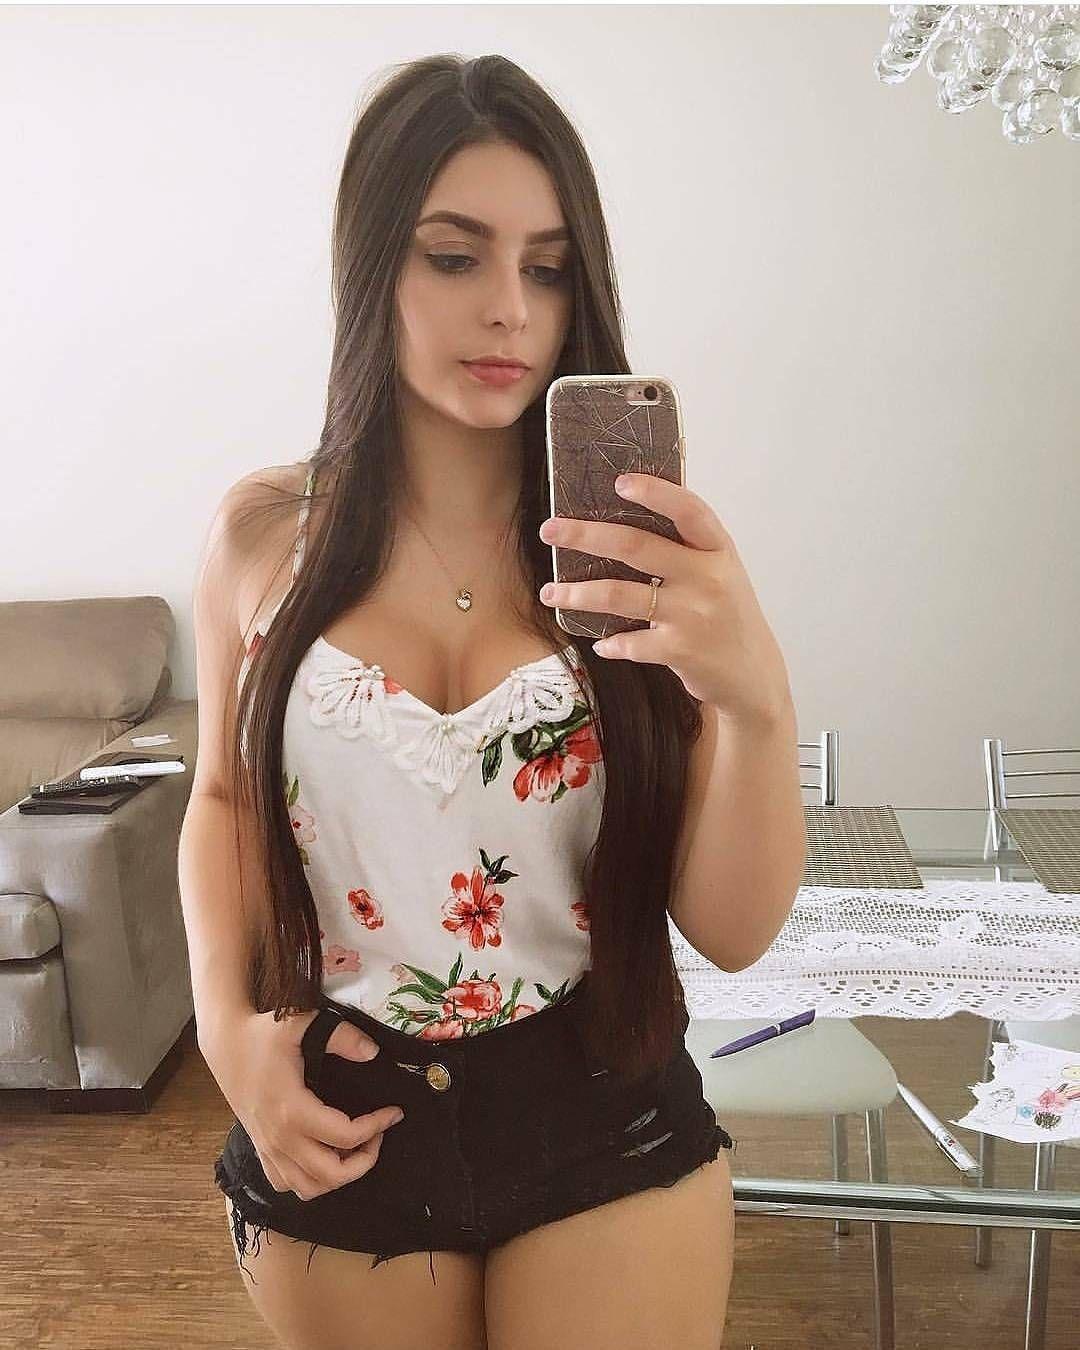 Sexy Hot Teen Girl Cute Pretty Instadaily Handsome Guapa Linda Minishorts Selfie